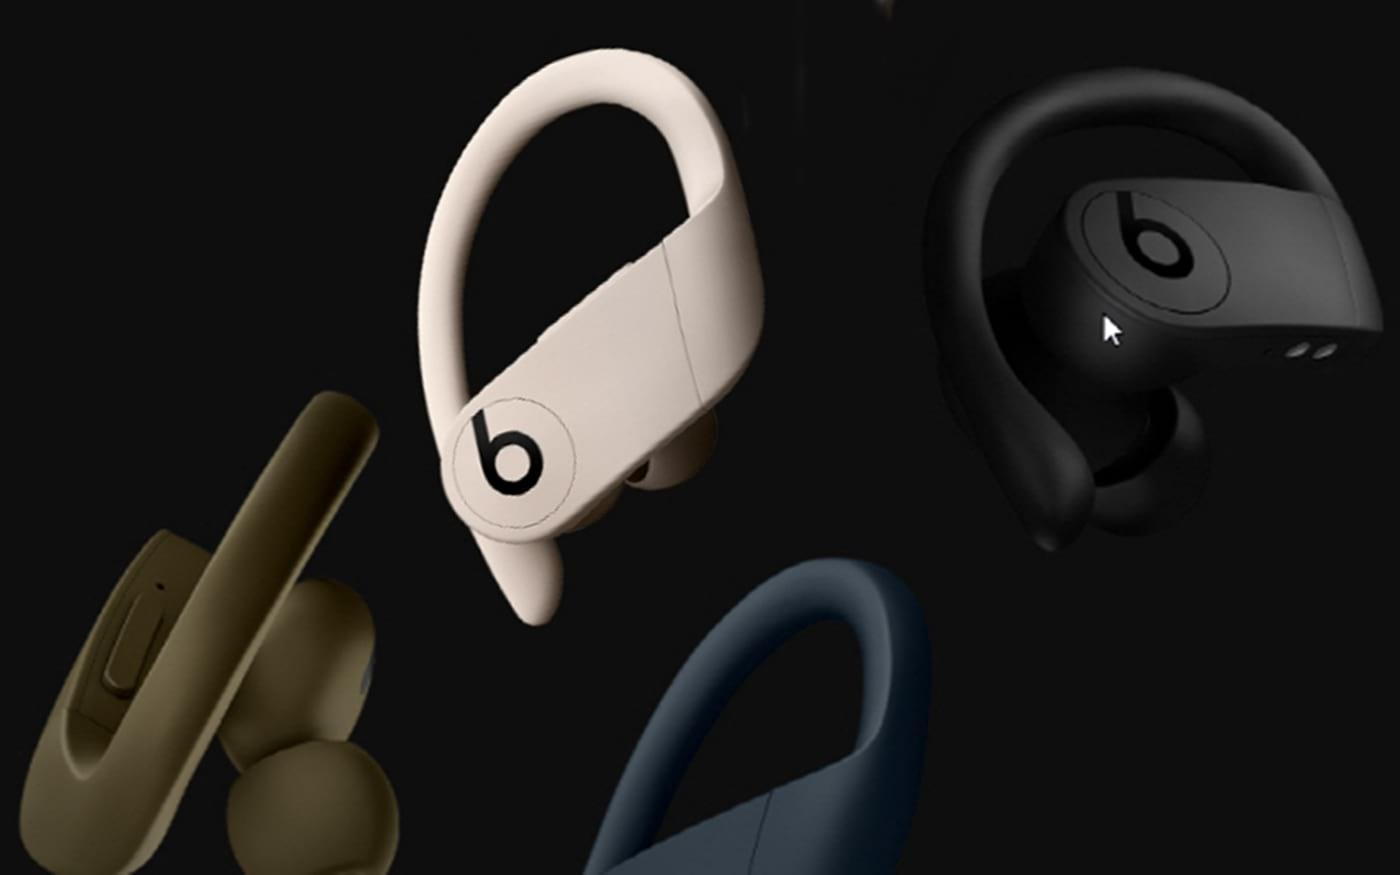 Anatel homologa os fones Powerbeats Pro da Apple